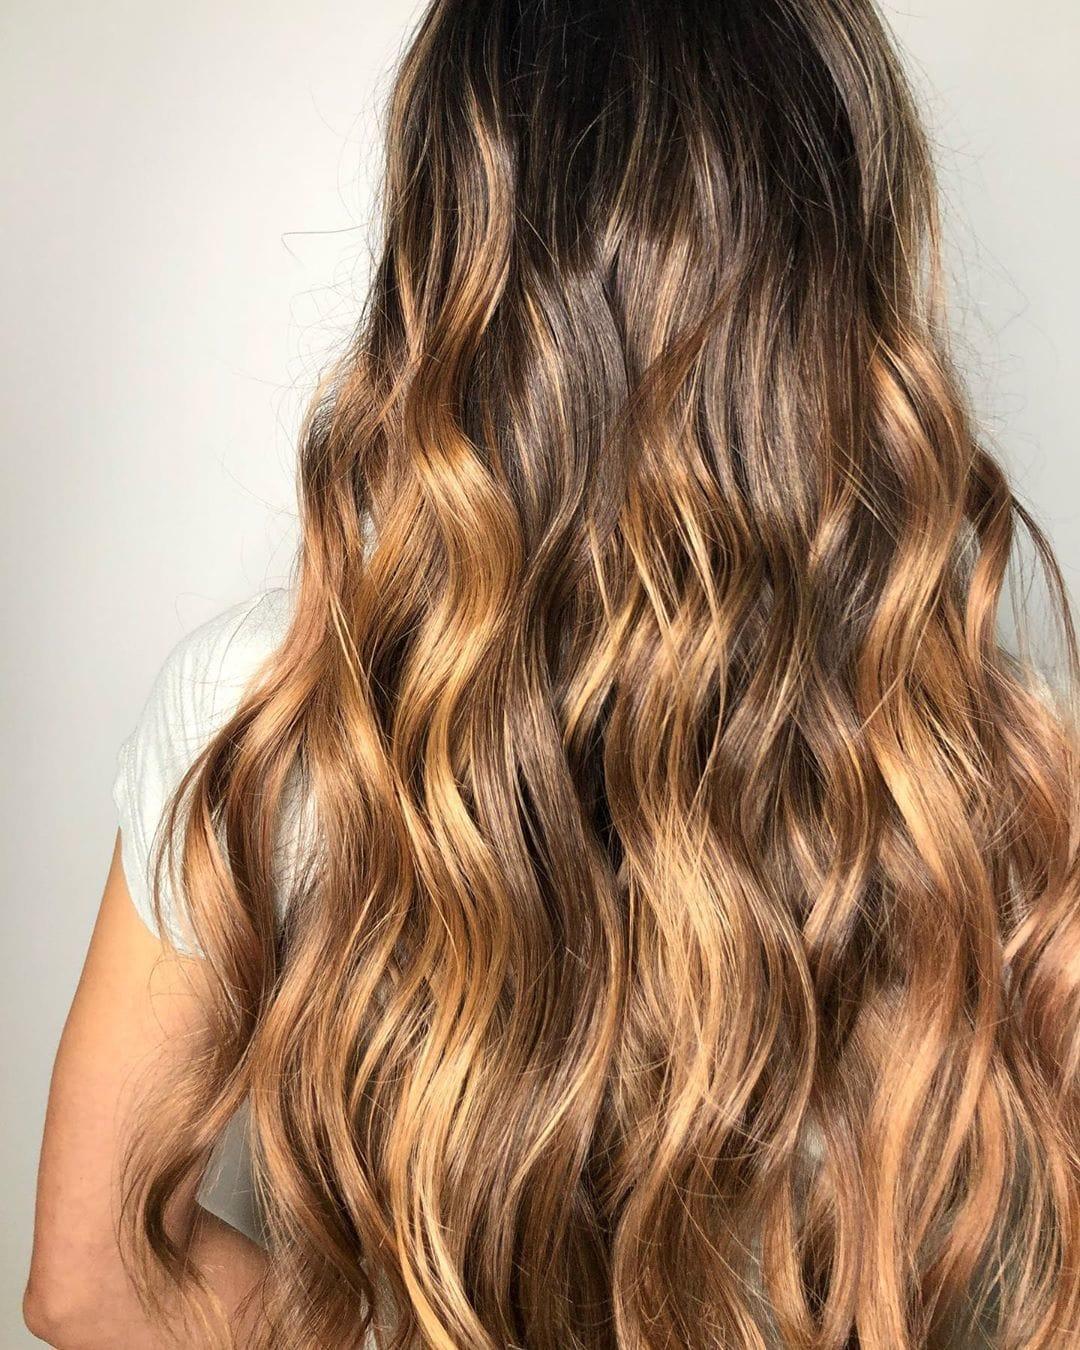 Woman with long dark honey blonde wavy hair